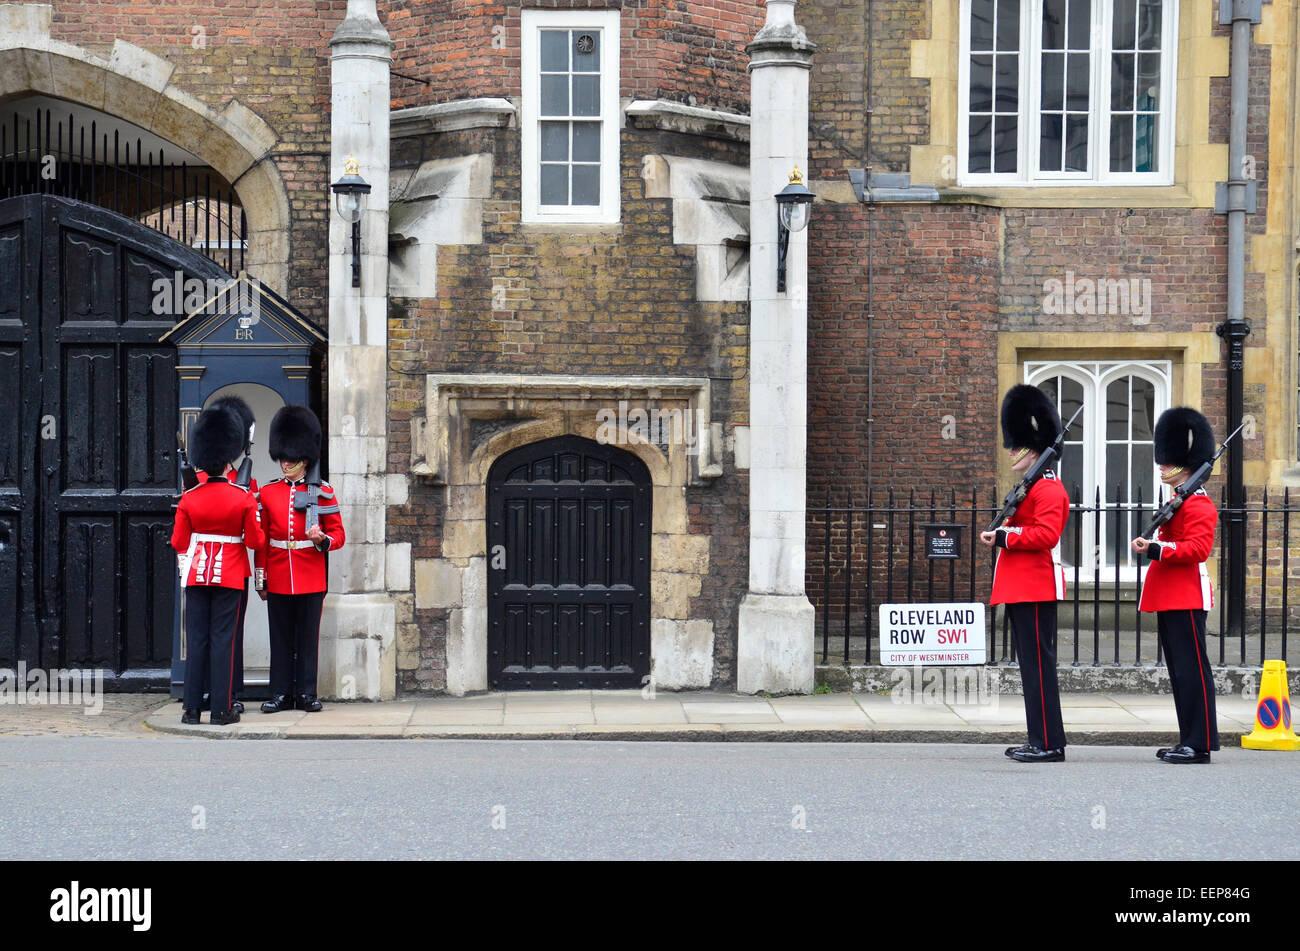 Guardias fuera de St James's Palace, Londres, Inglaterra, Reino Unido. Imagen De Stock